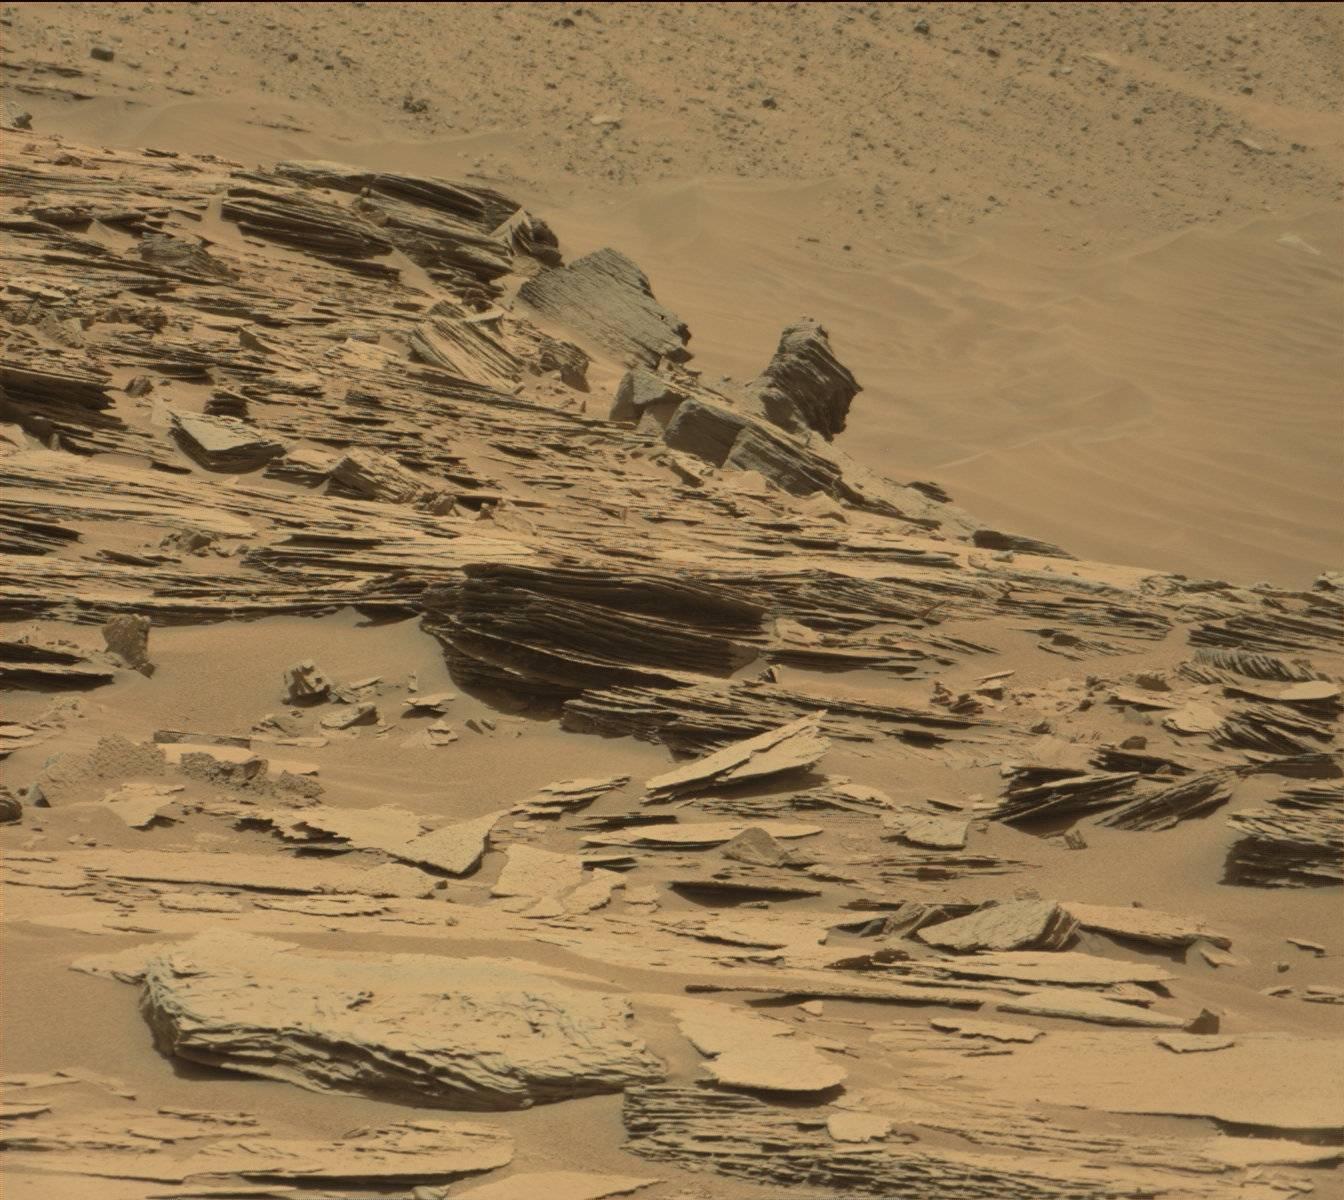 report on mars nasa - photo #16